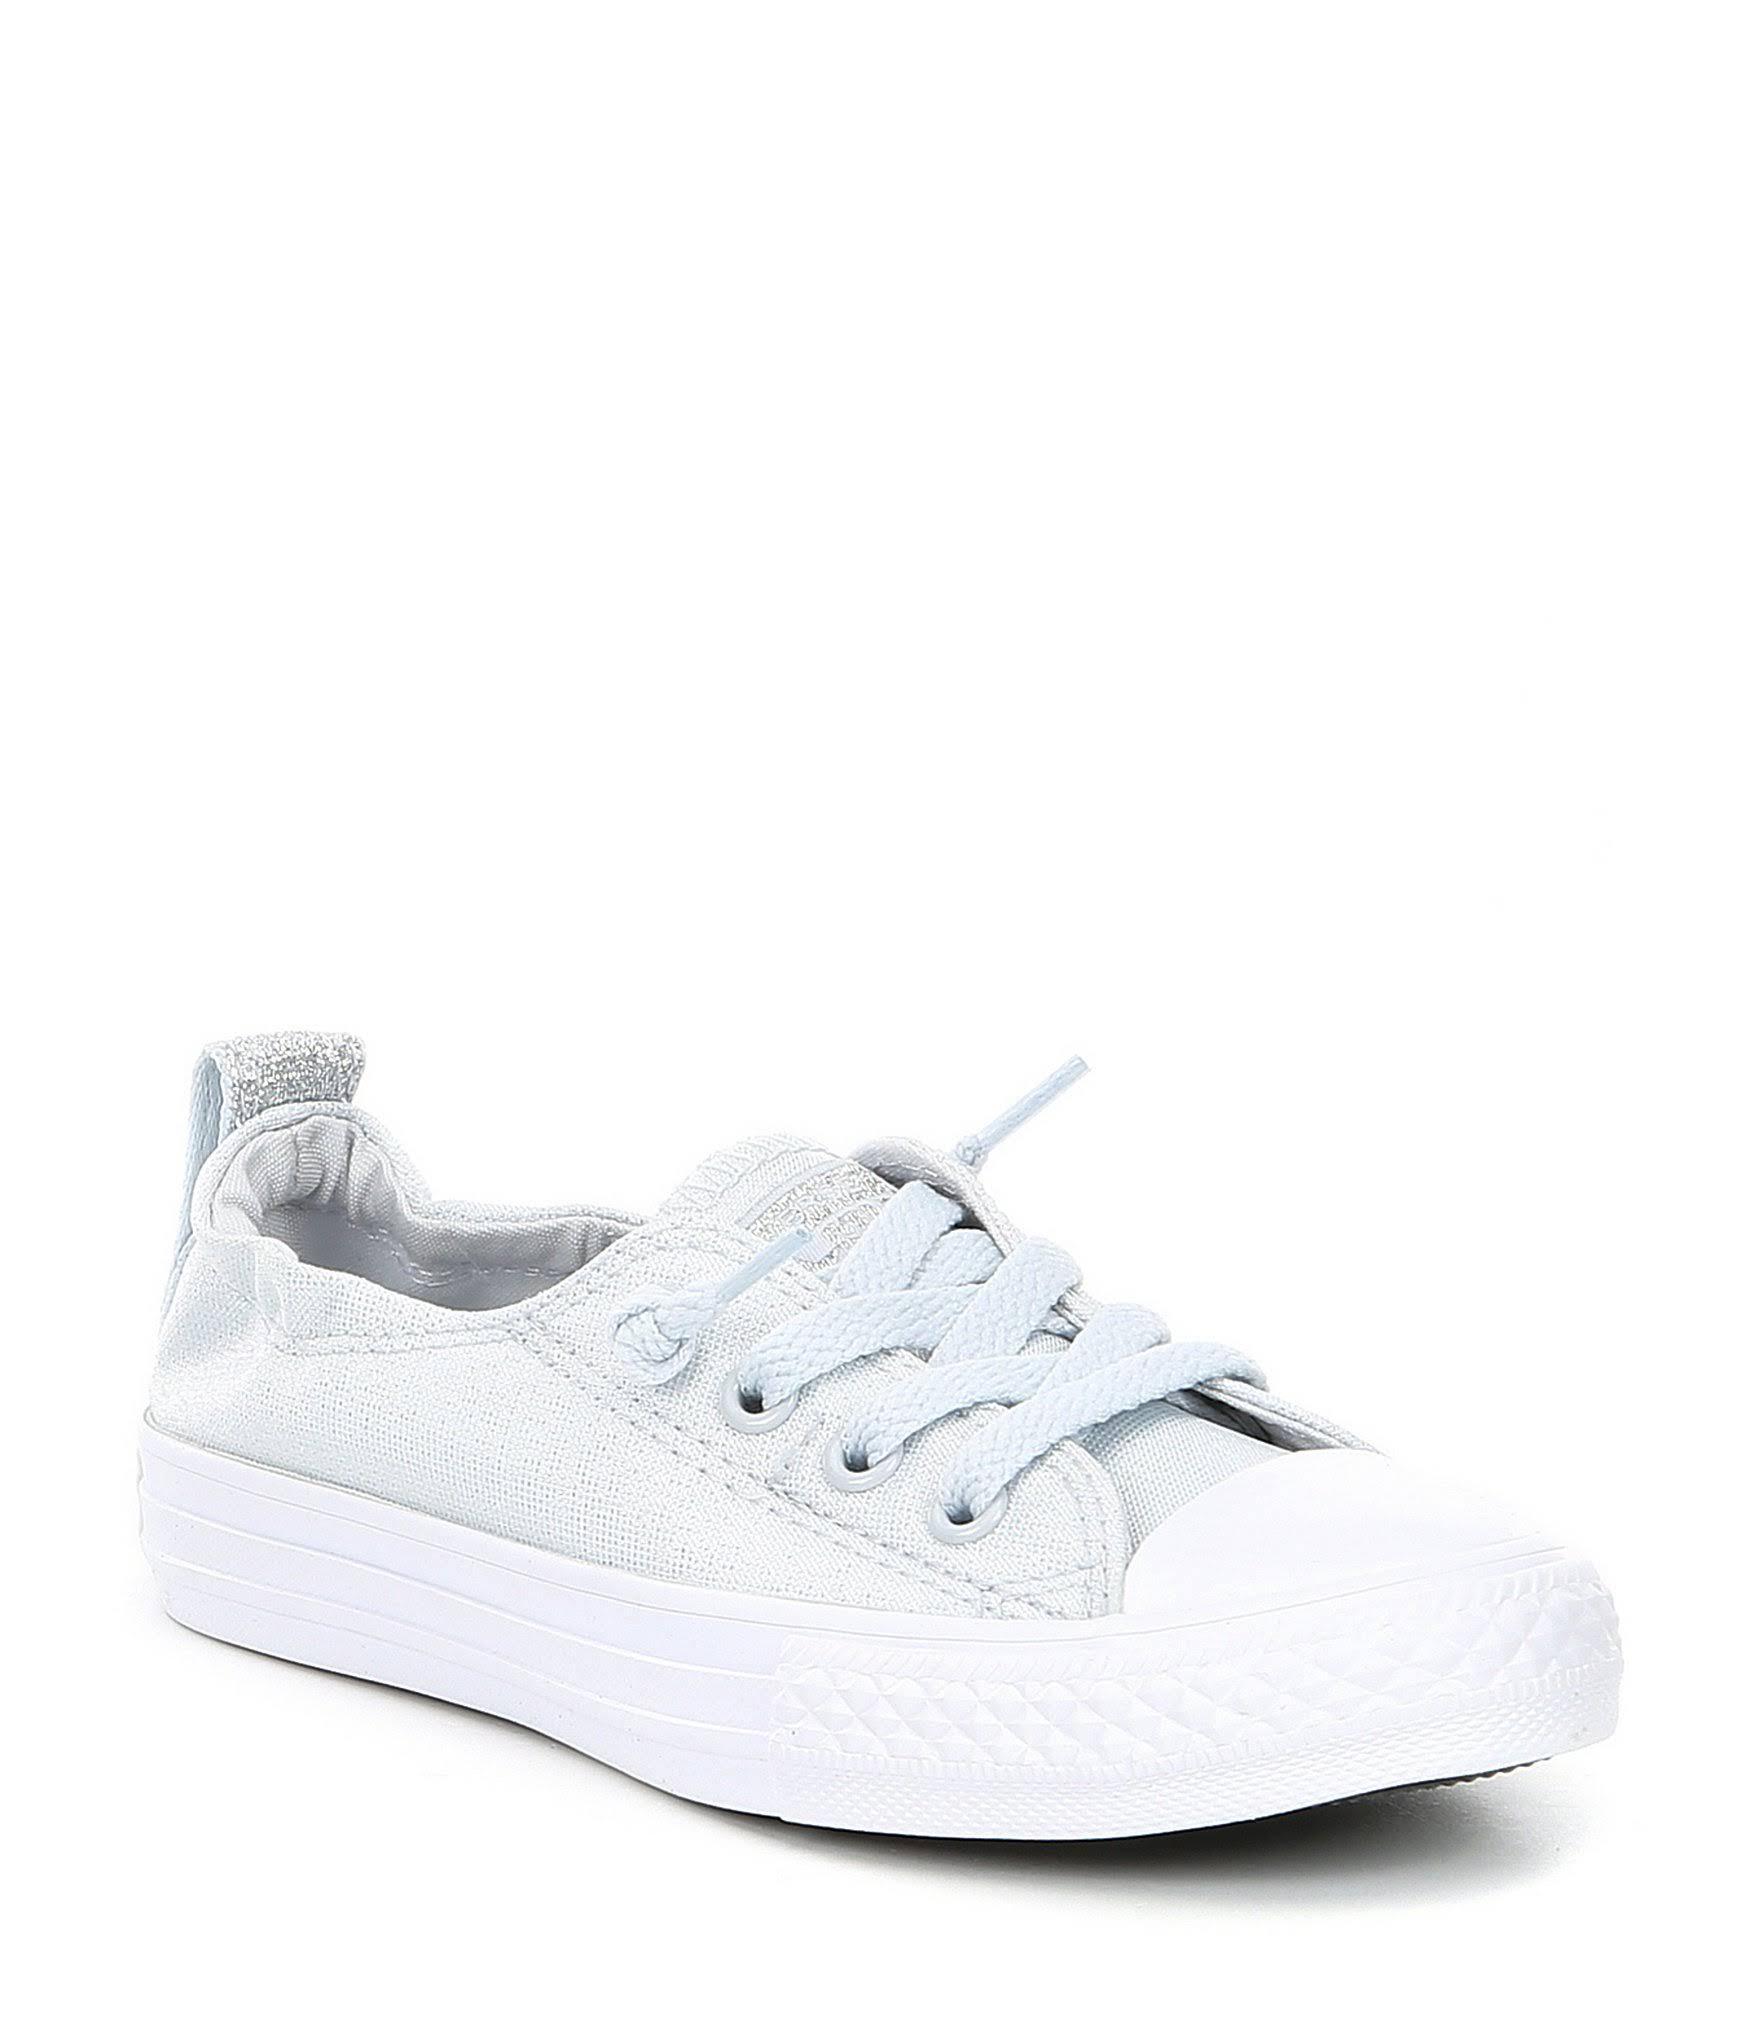 bij Platinumzilverwit Shoreline KidBig Converse Shine SneakerpeuterLittle Platinums Mono Nordstrom Kidnormale 13 00Pure verkoopprijs40 Rack stdCQrhx